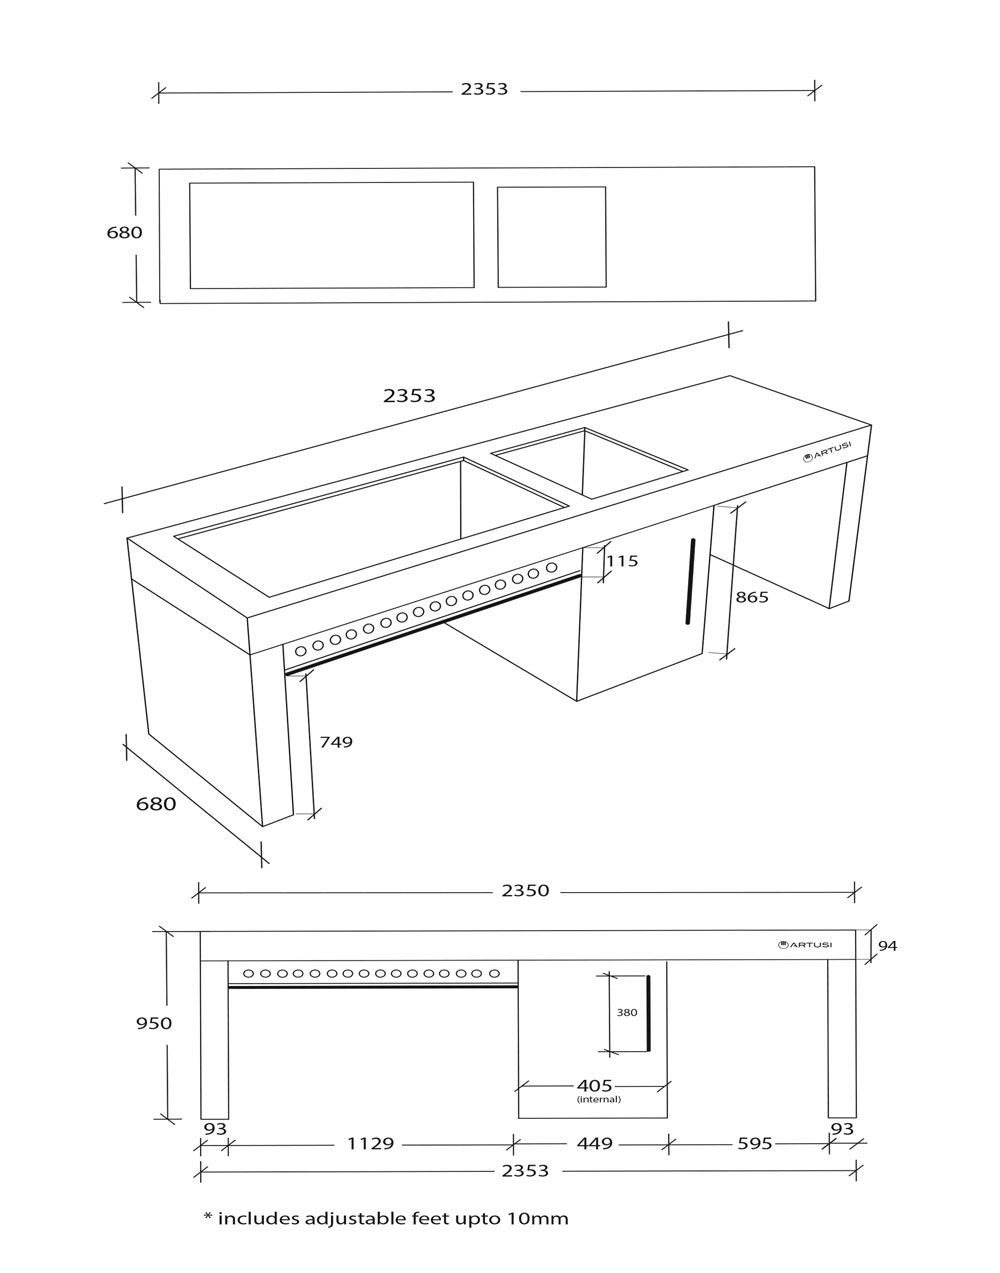 abs1-line-drawning.jpg